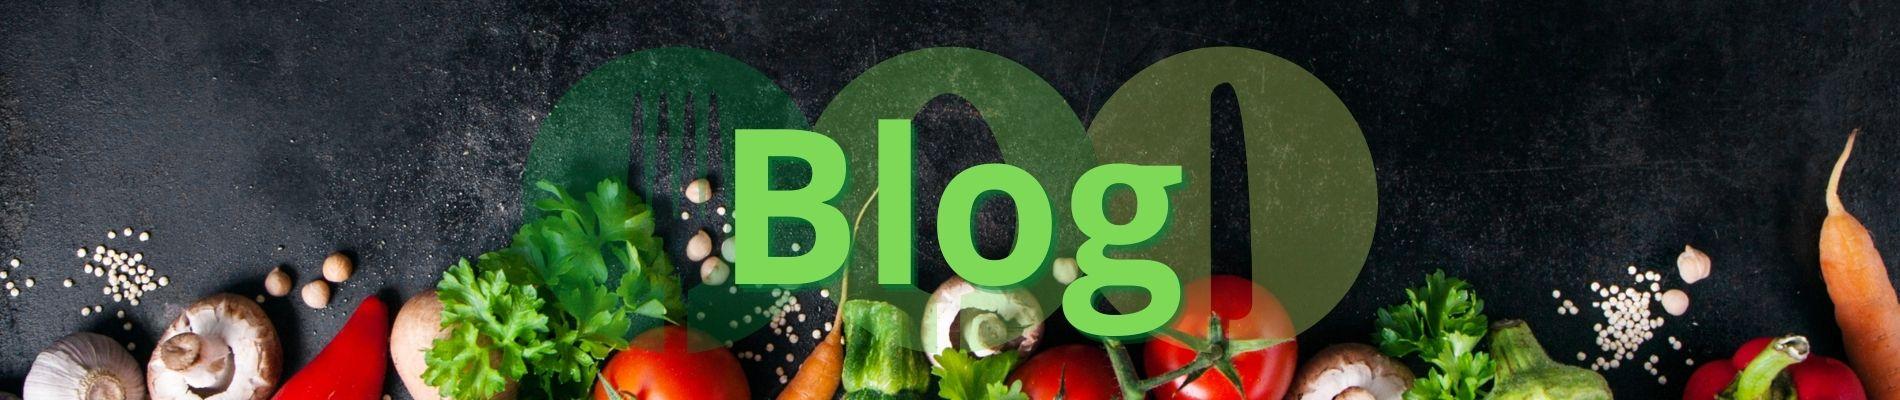 Restaurants Neumarkt Blog